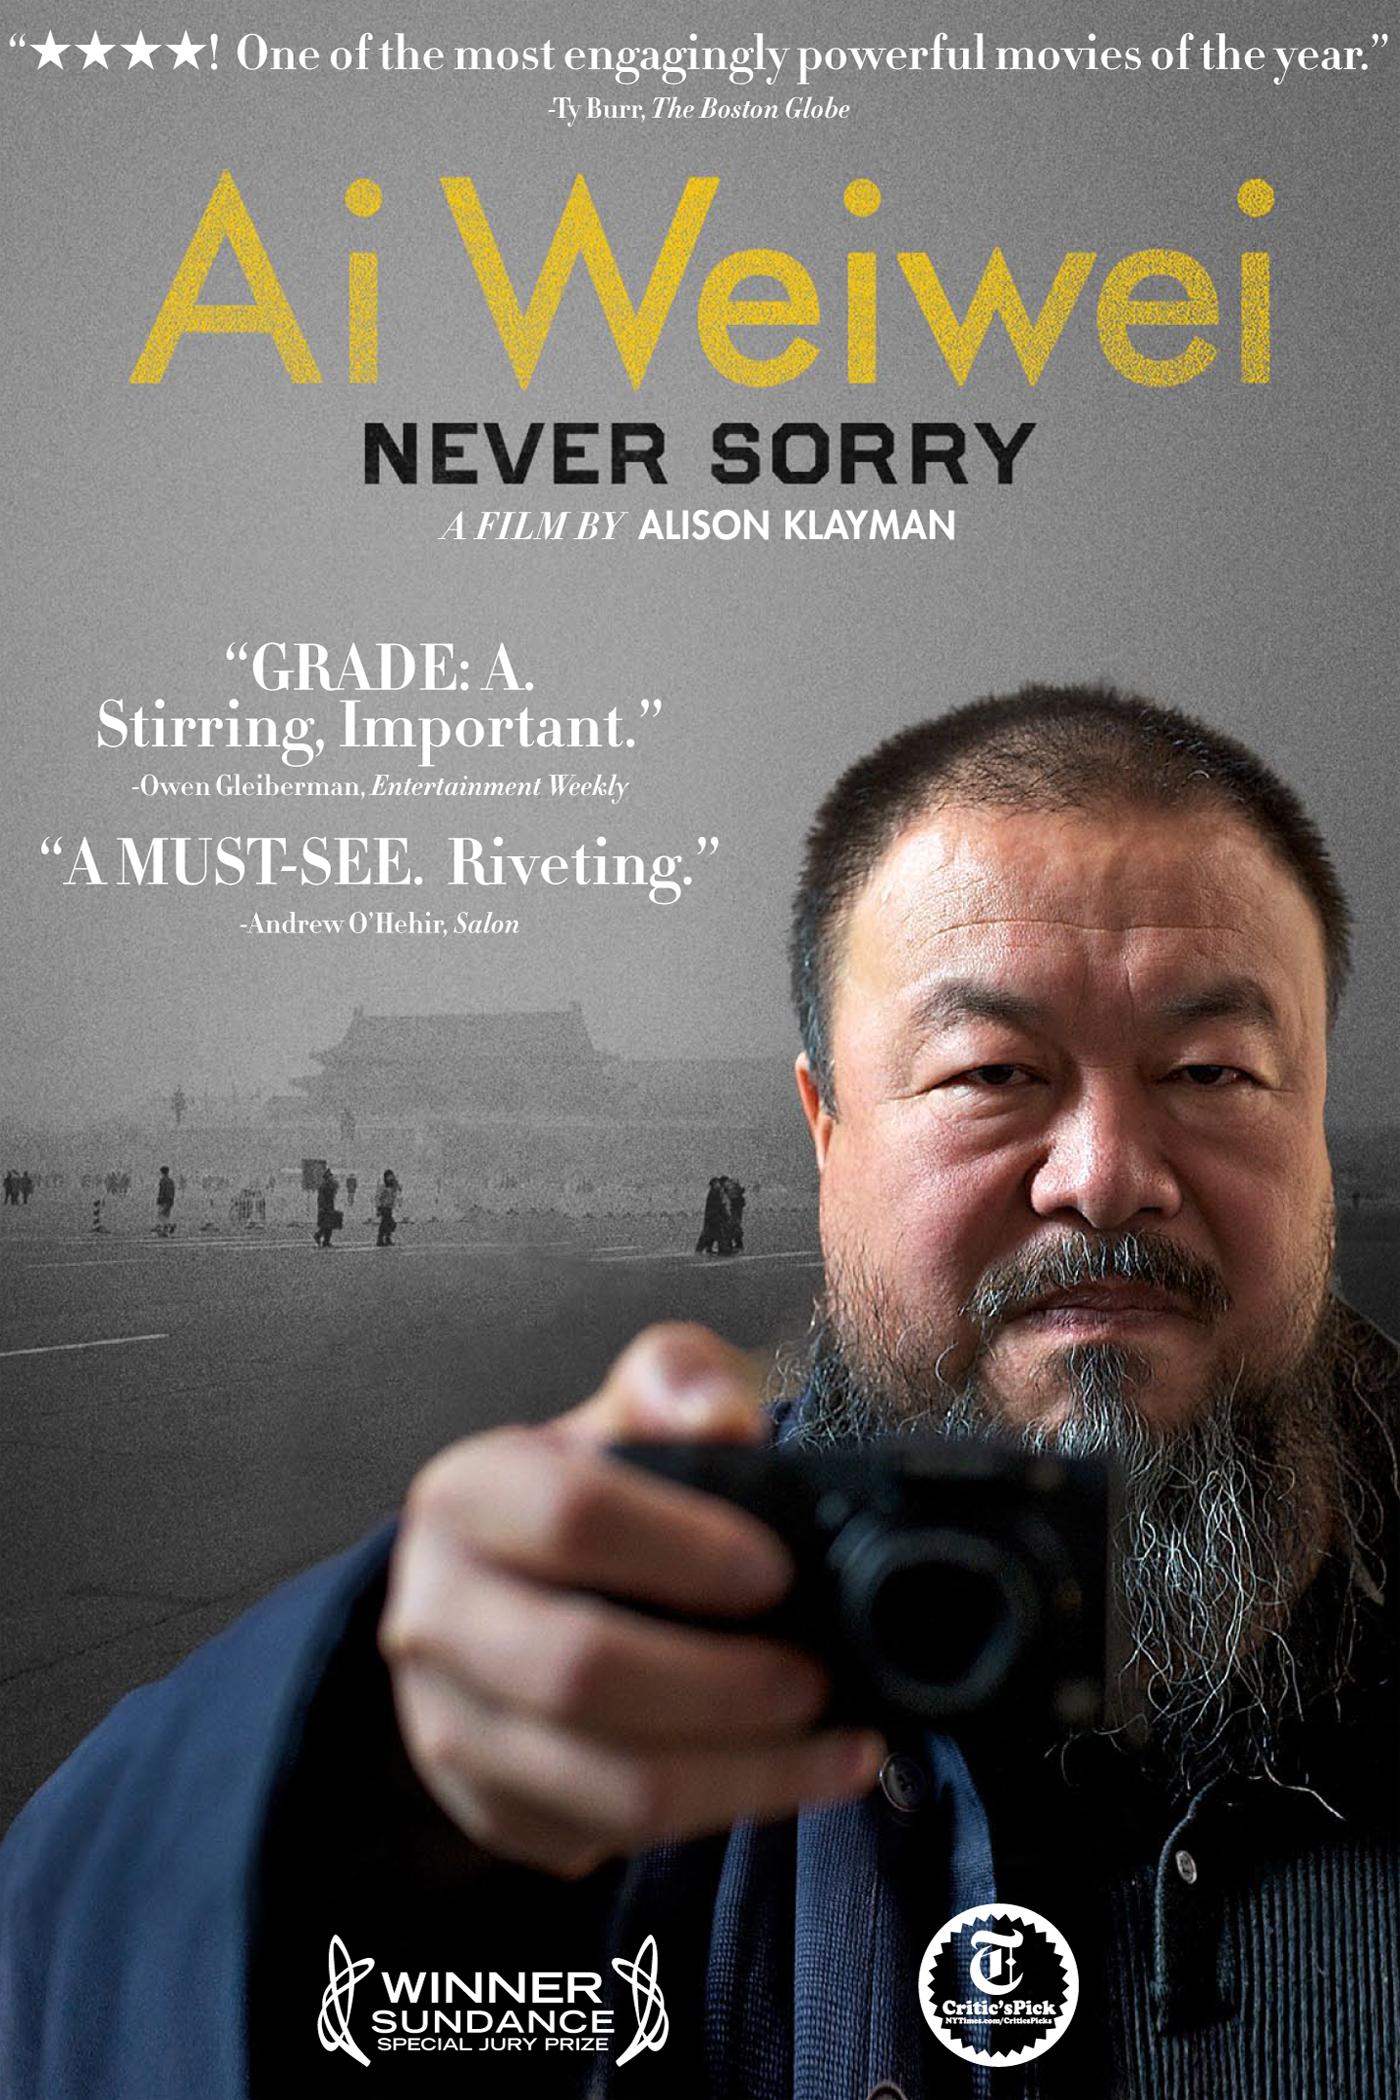 ai-weiwei-never-sorry-dvd-artwork-ai-weiwei.jpg